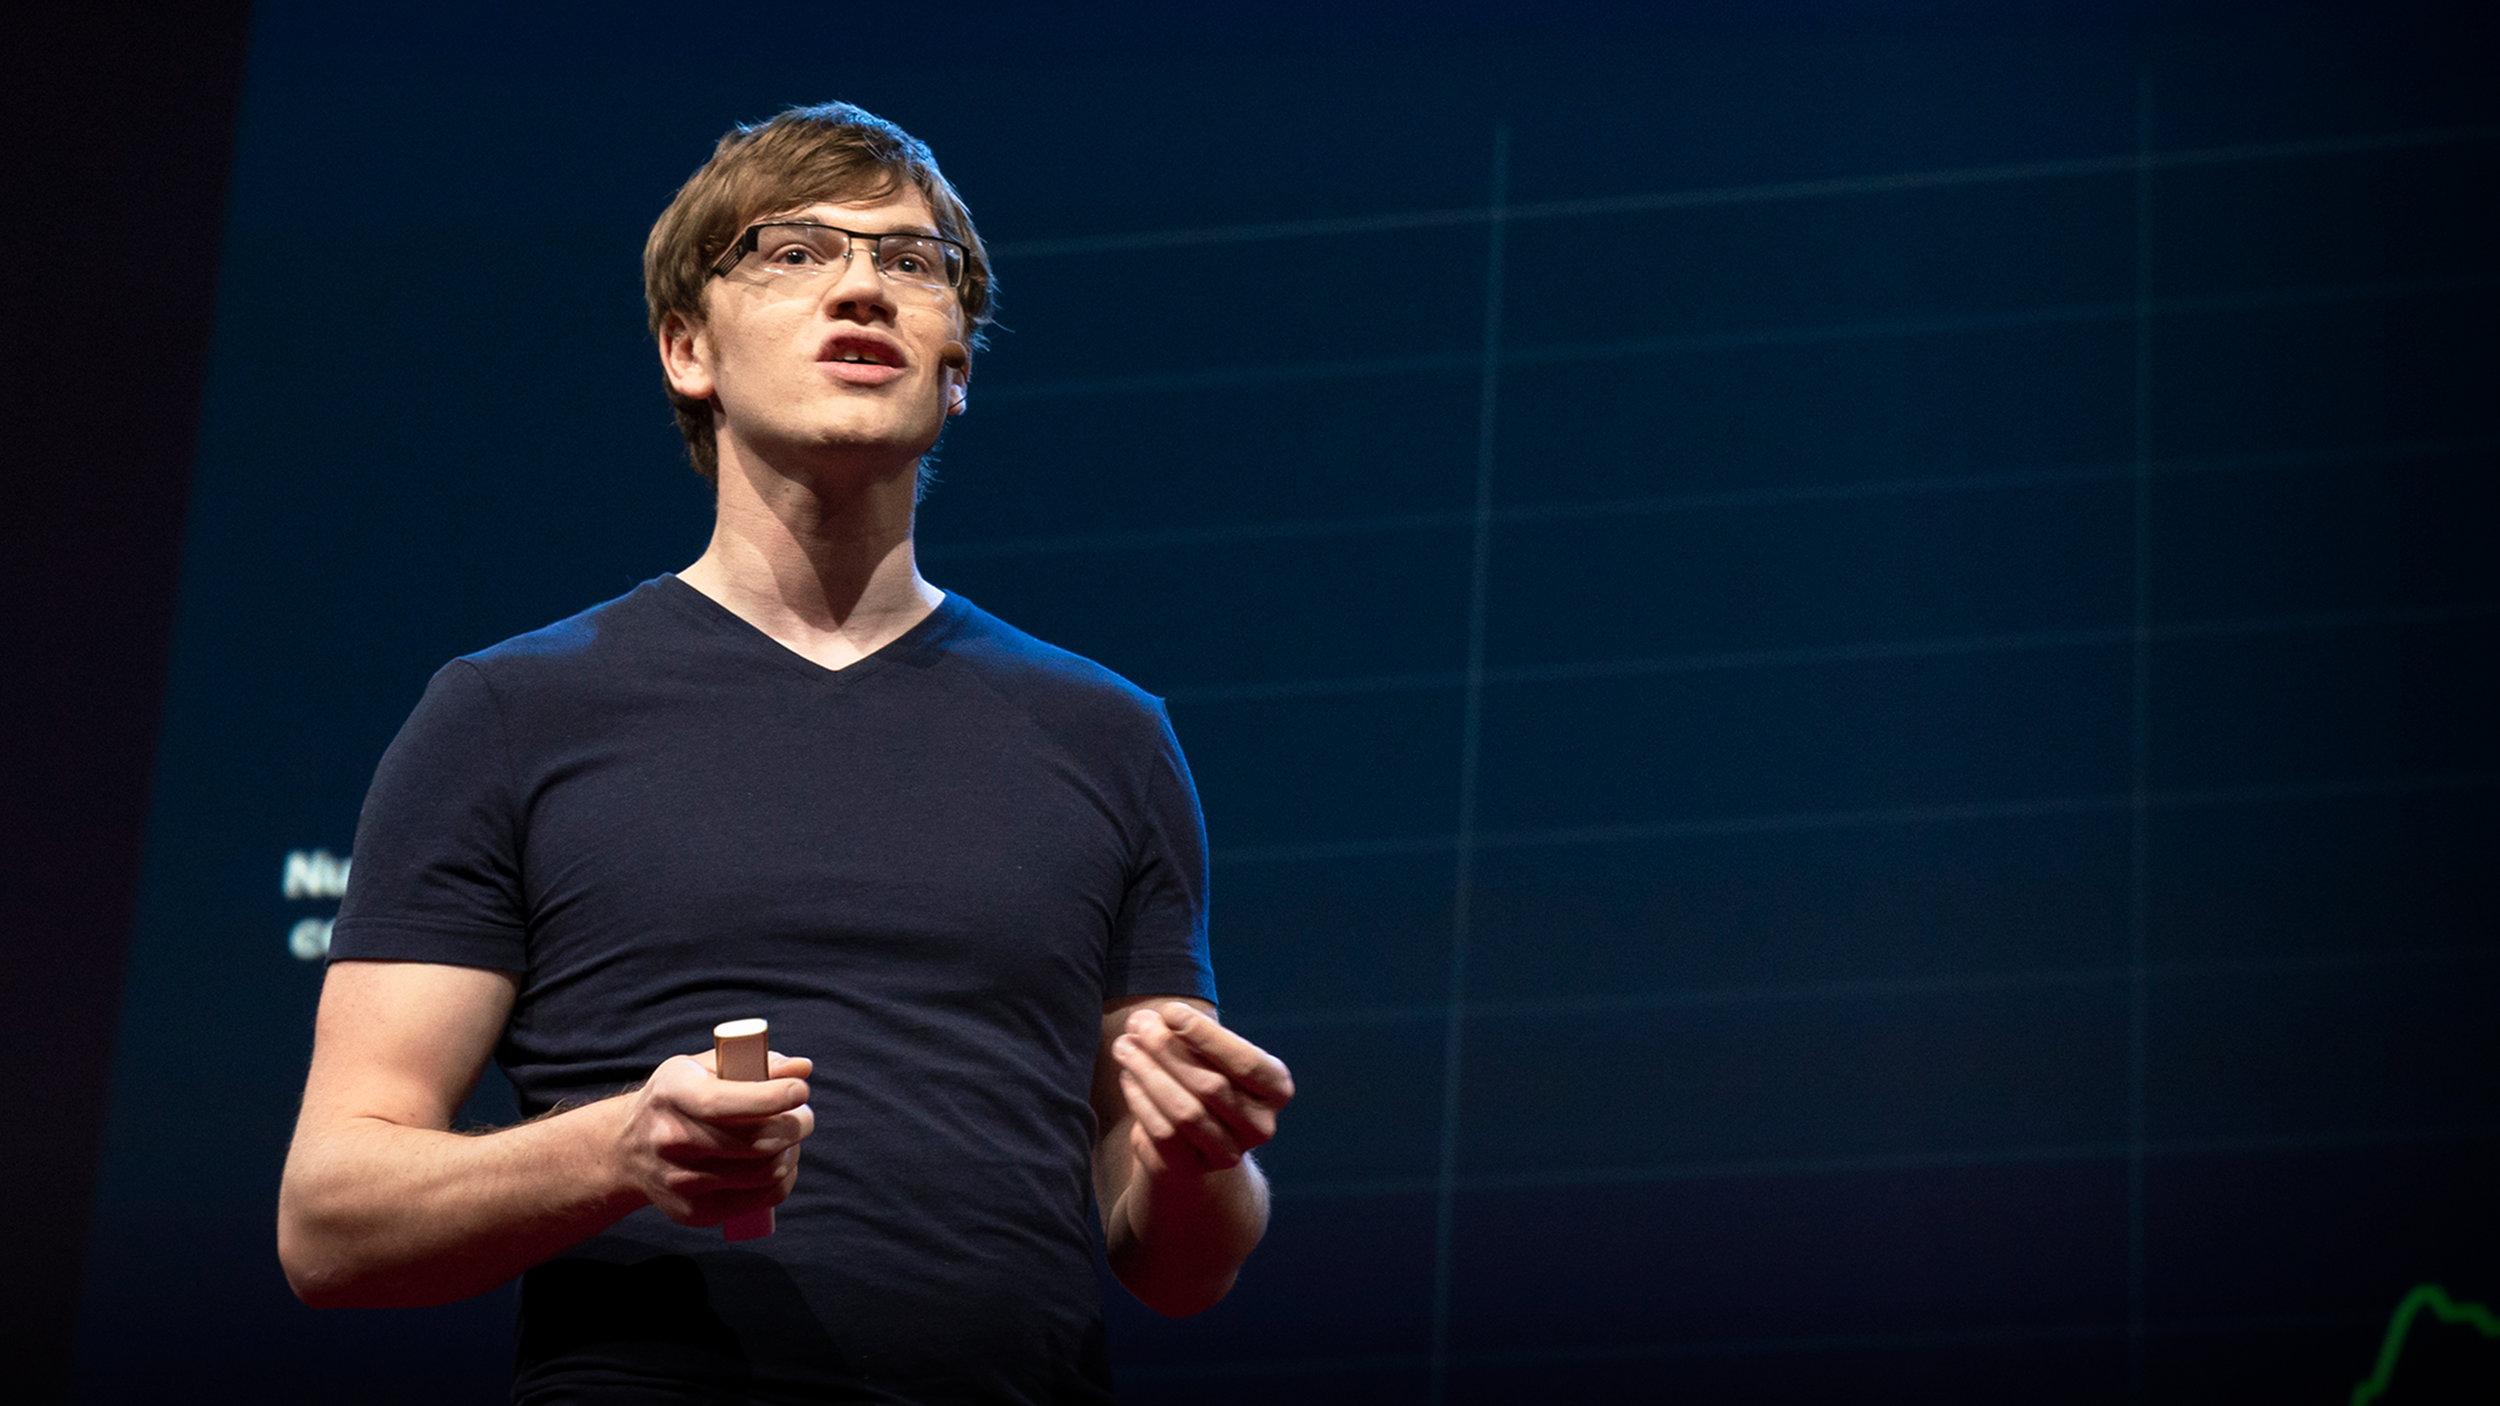 WillMacAskill_2018-TED.jpg